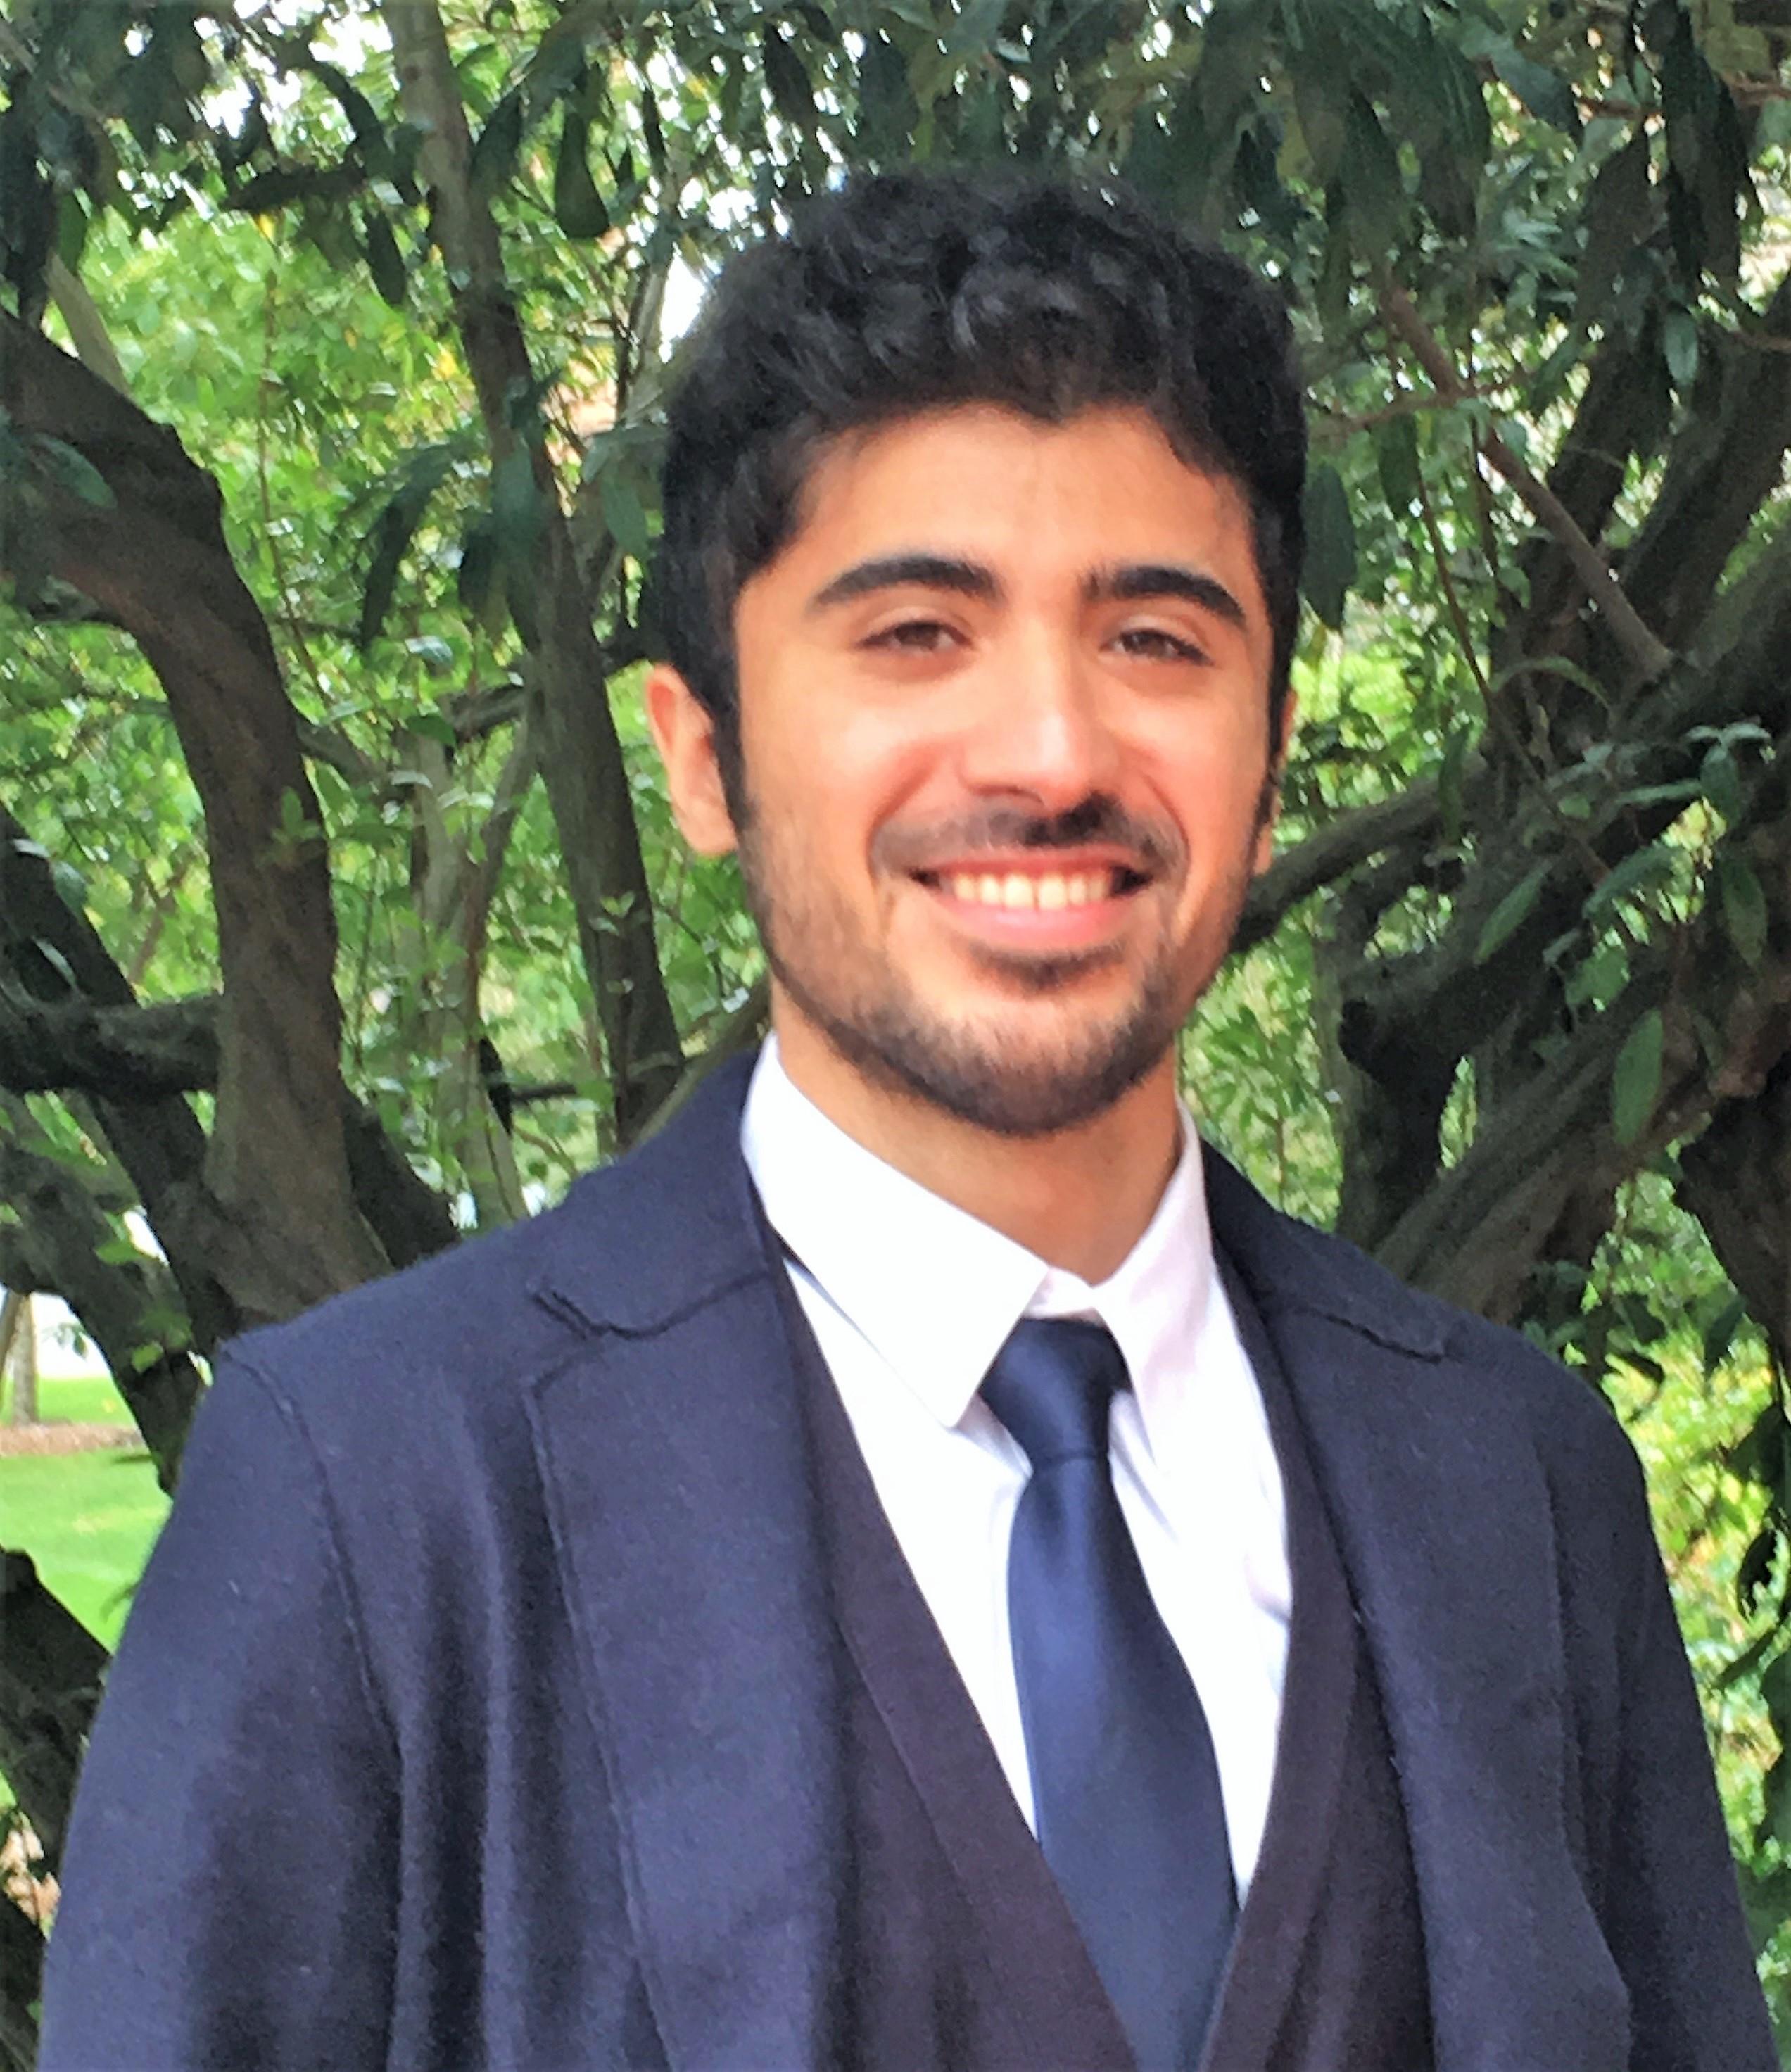 Mohammed Alghezi